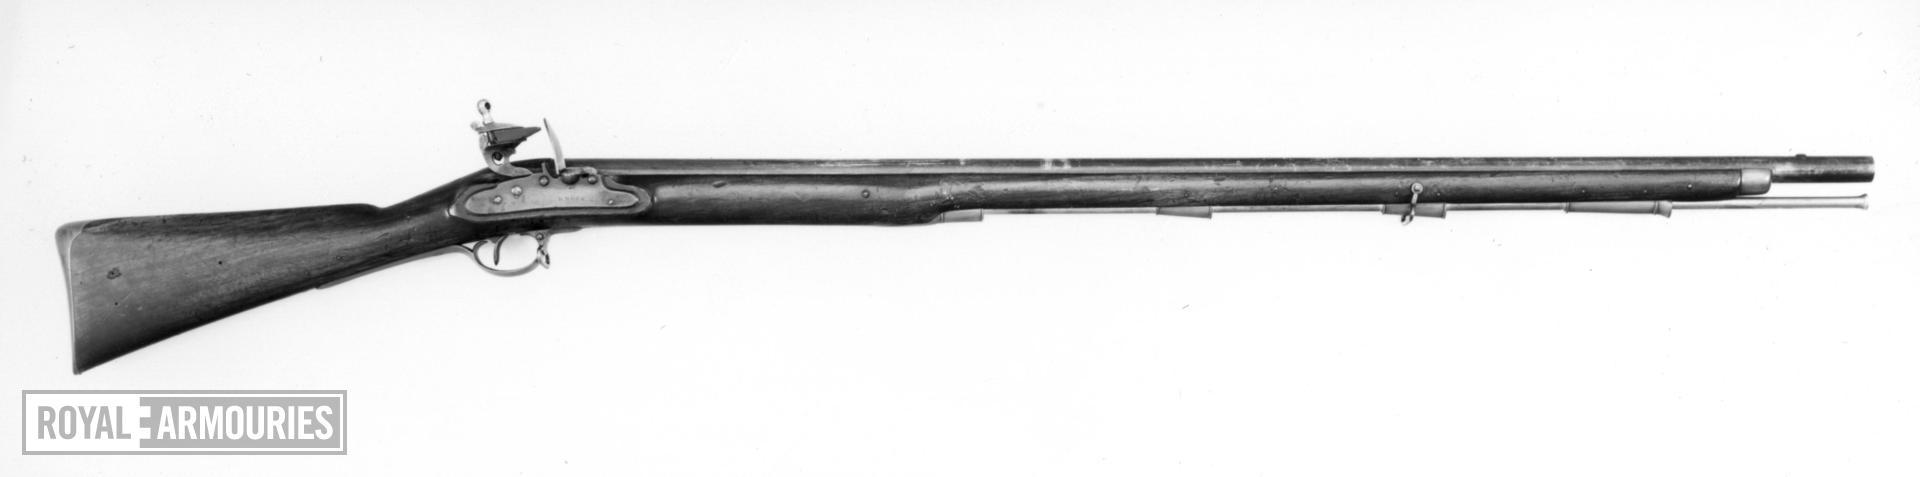 Flintlock muzzle-loading military musket - Duke of Richmond's Musket